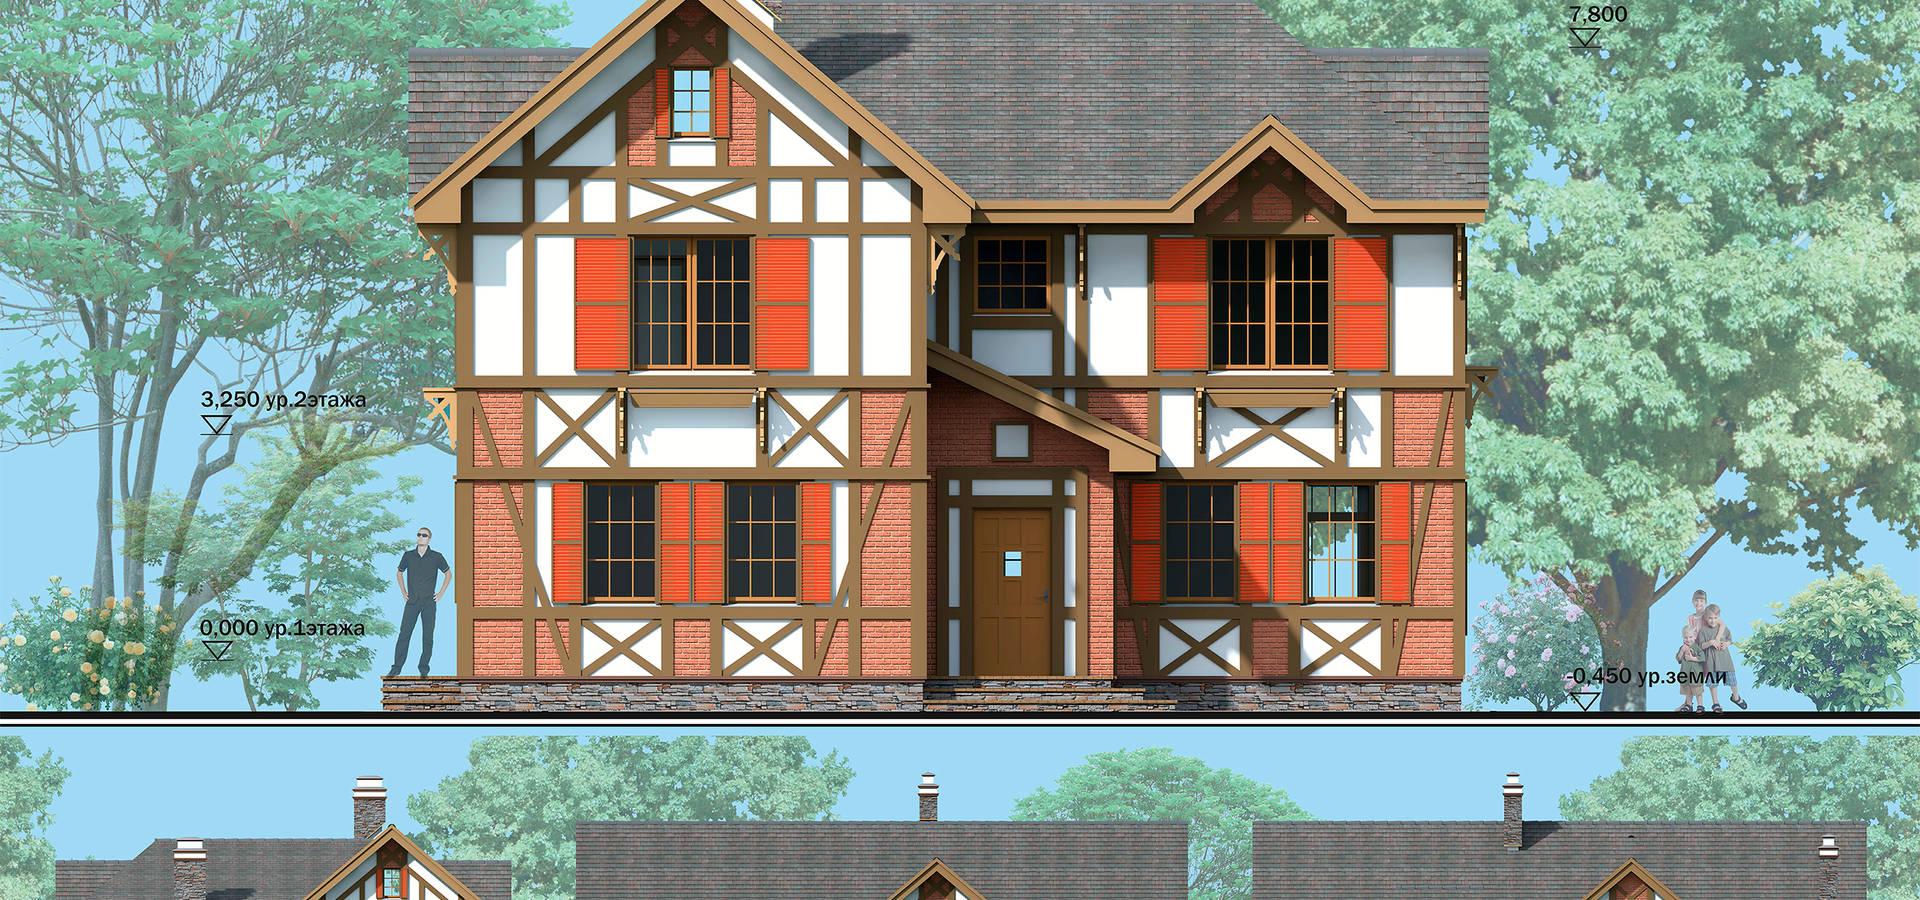 Fusion House